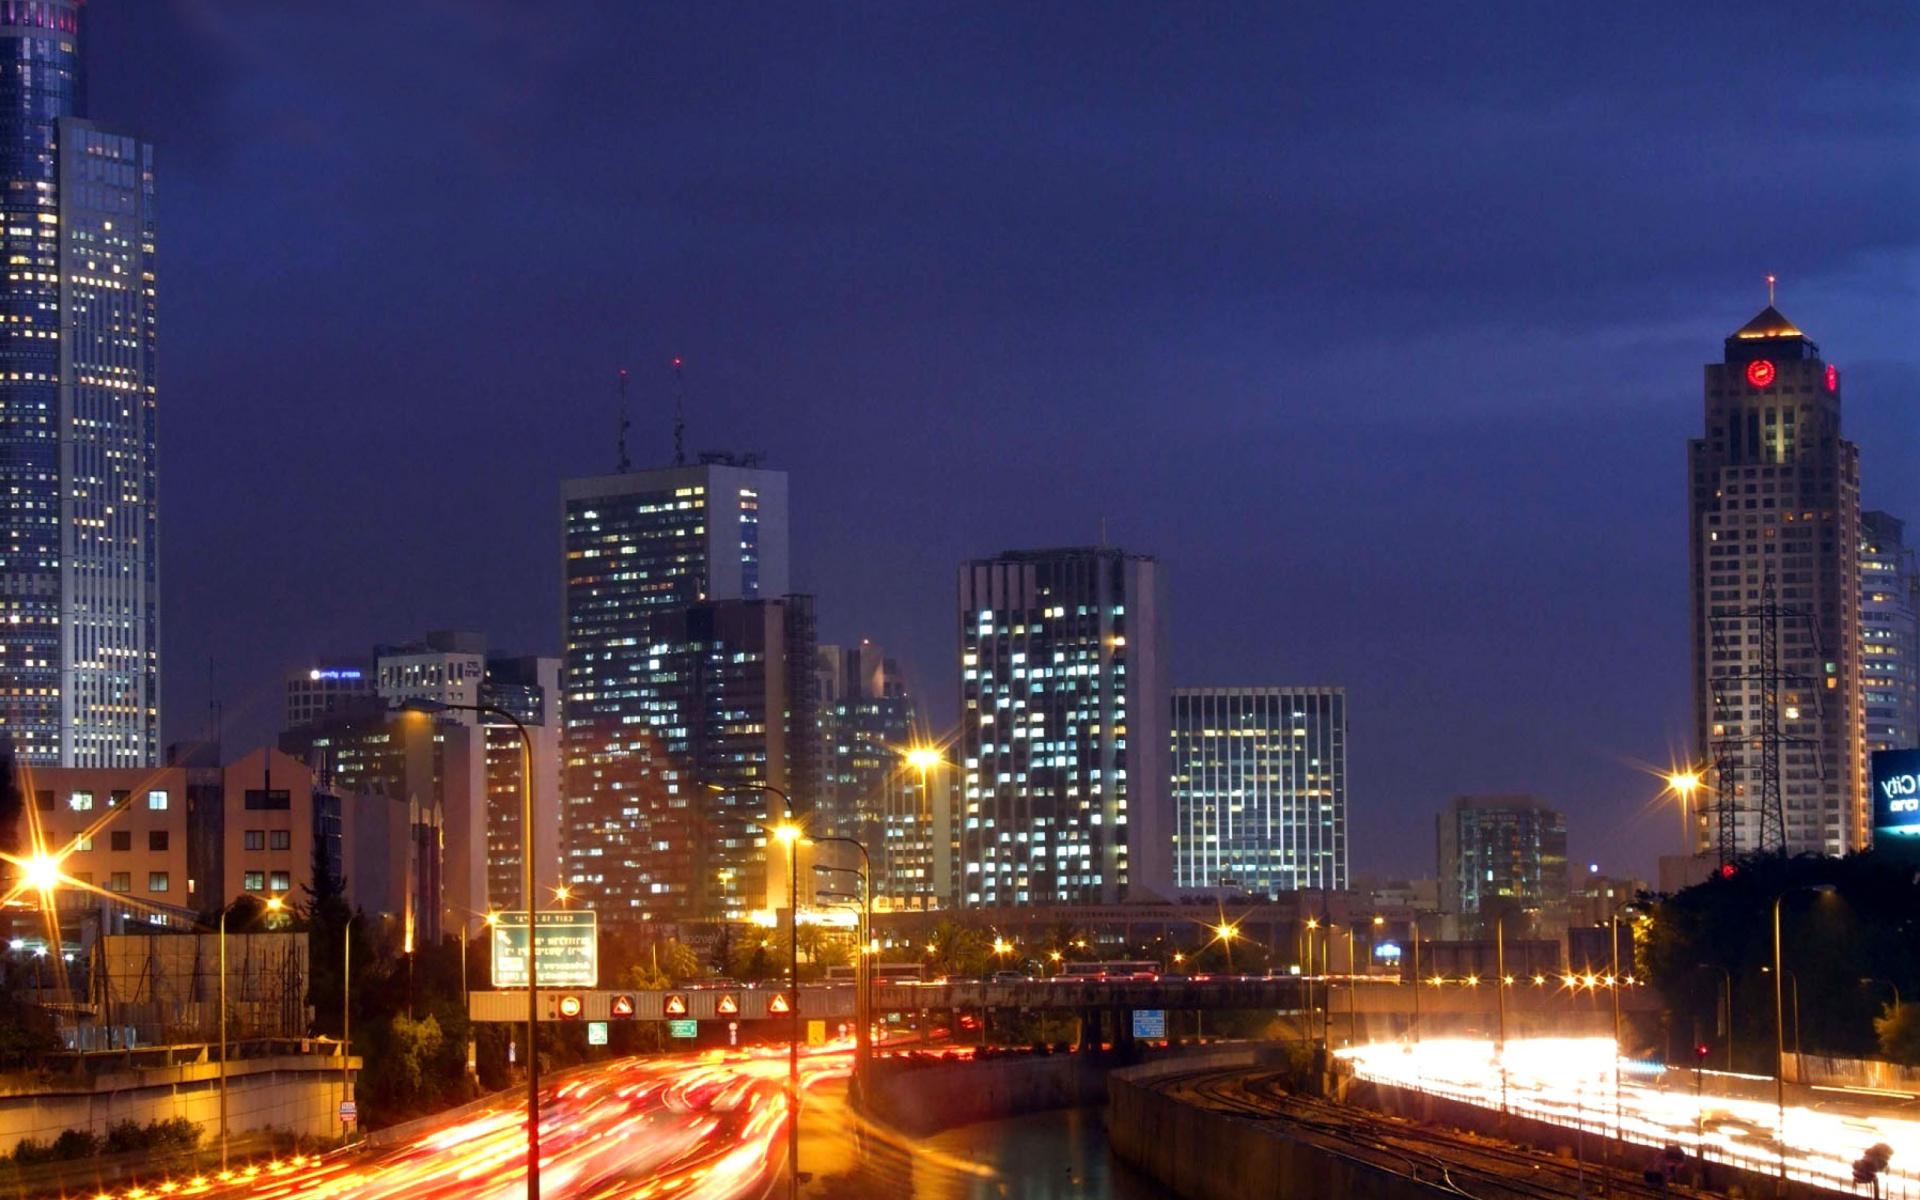 Tel Aviv Hd: Tel Aviv Wallpaper For Widescreen Desktop PC 1920x1080 Full HD